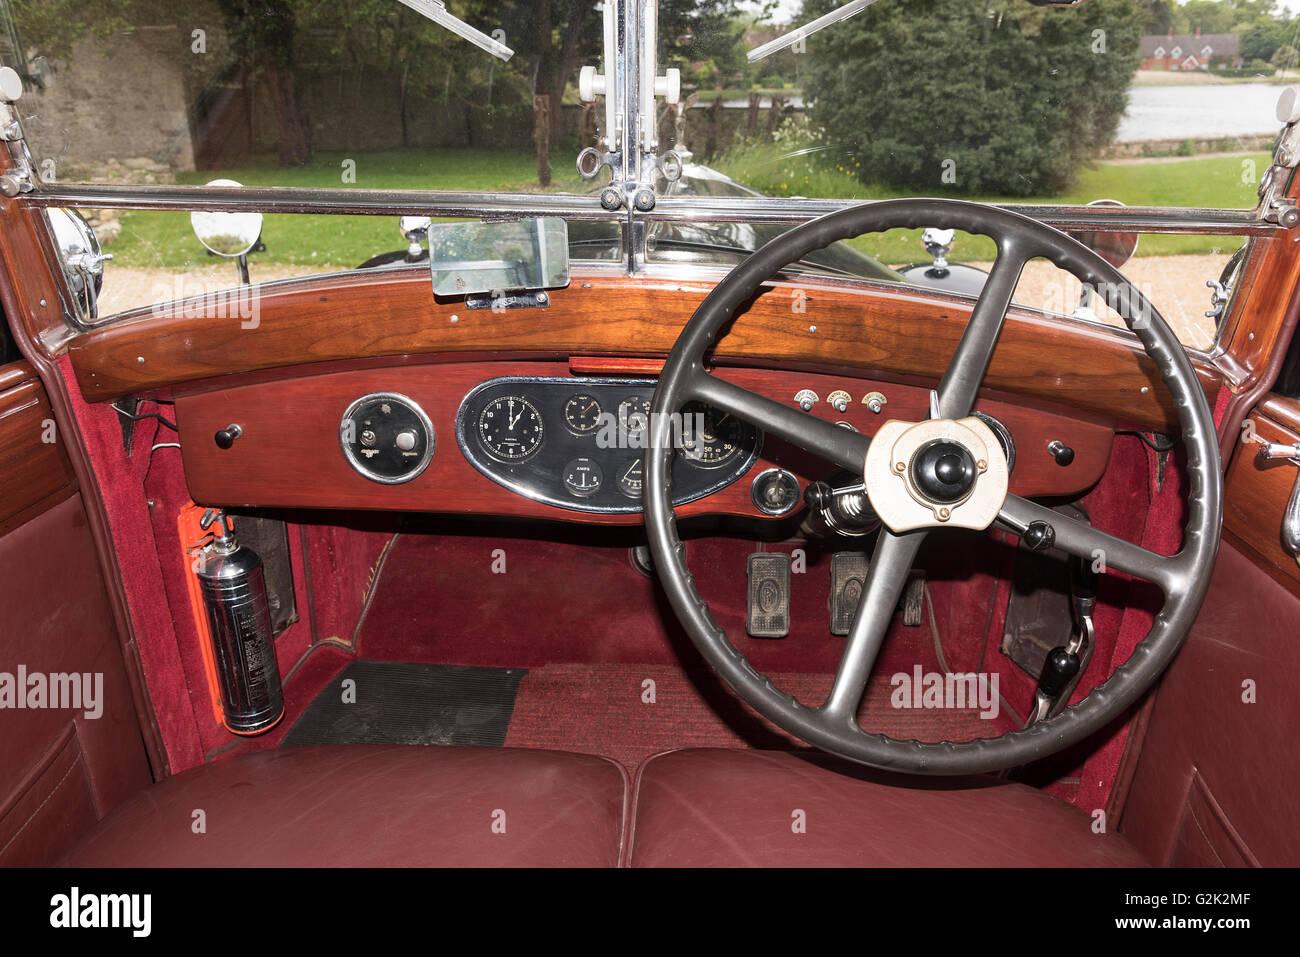 1933 Rolls Royce Phantom II Sedanca de Ville interior - Stock Image